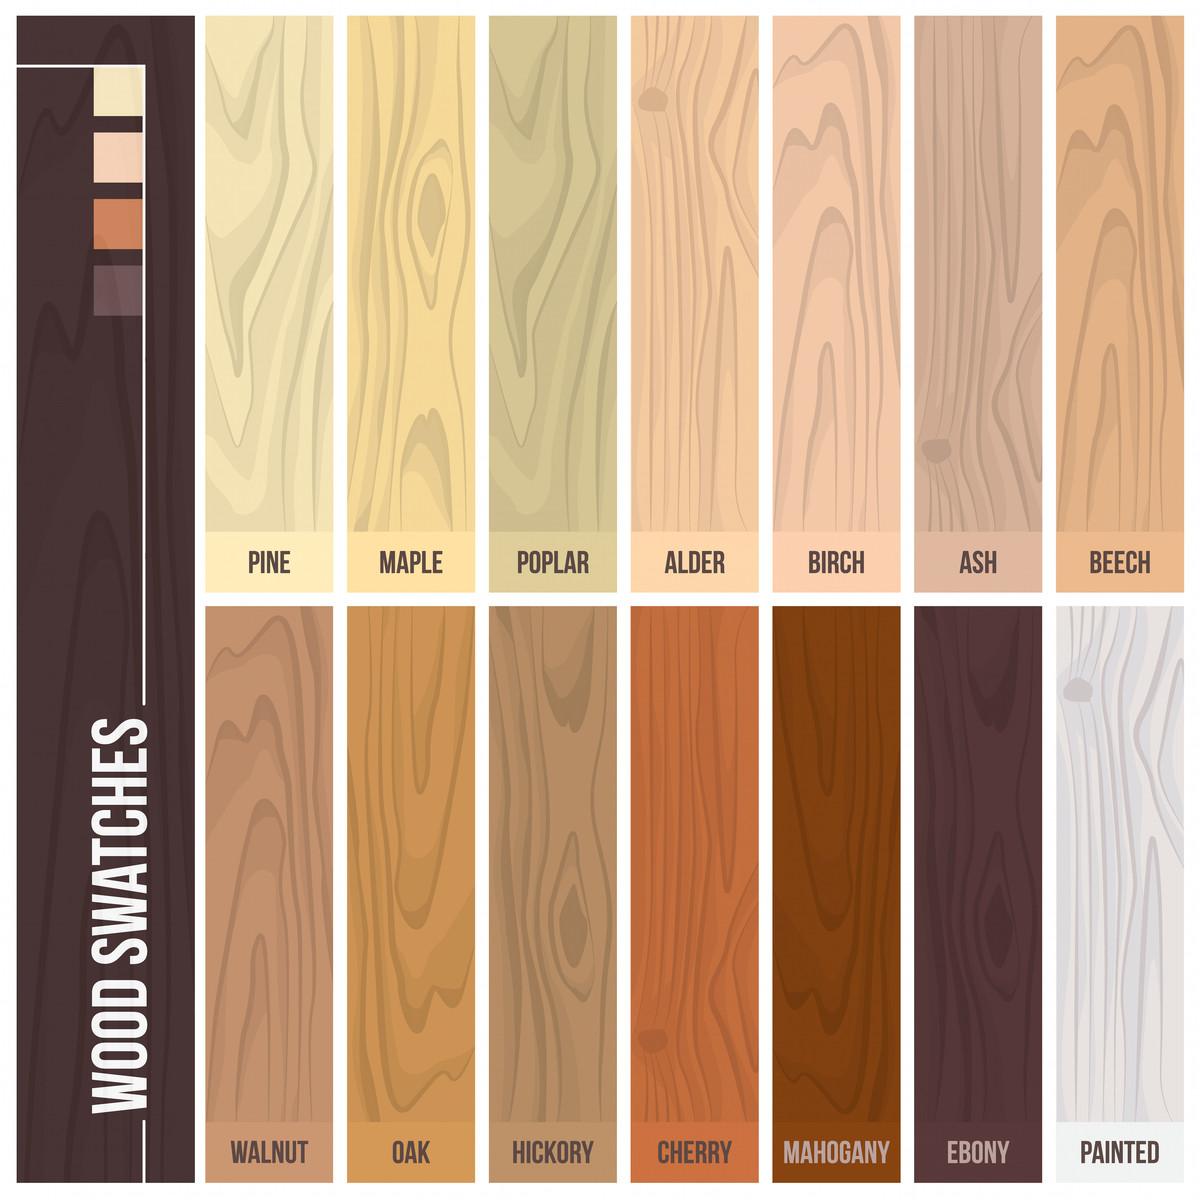 5 inch vs 7 inch hardwood flooring of 12 types of hardwood flooring species styles edging dimensions within types of hardwood flooring illustrated guide